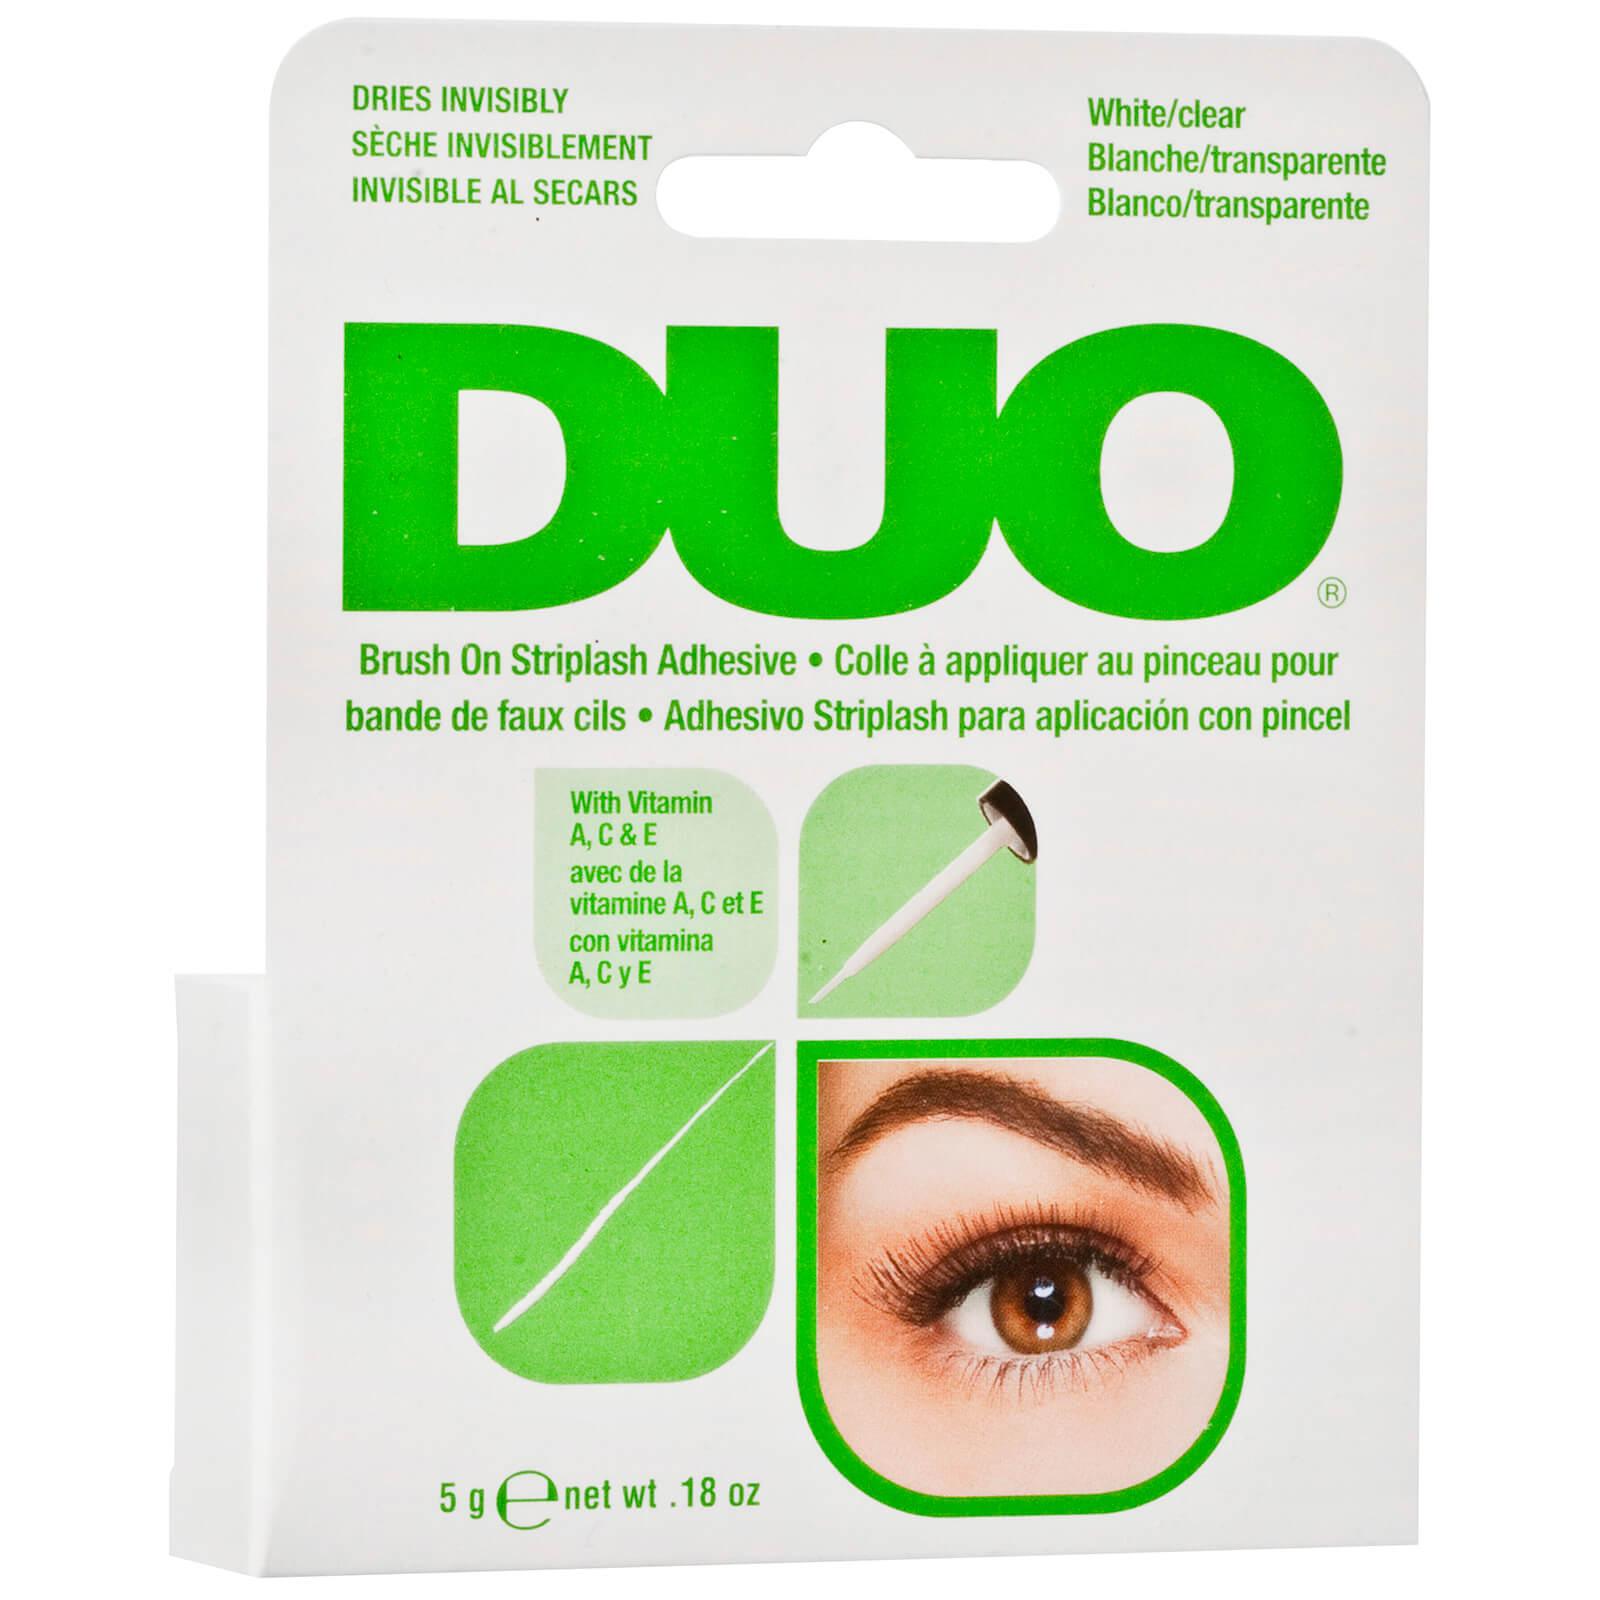 Купить Duo Brush On Striplash Adhesive - White/Clear (5g)